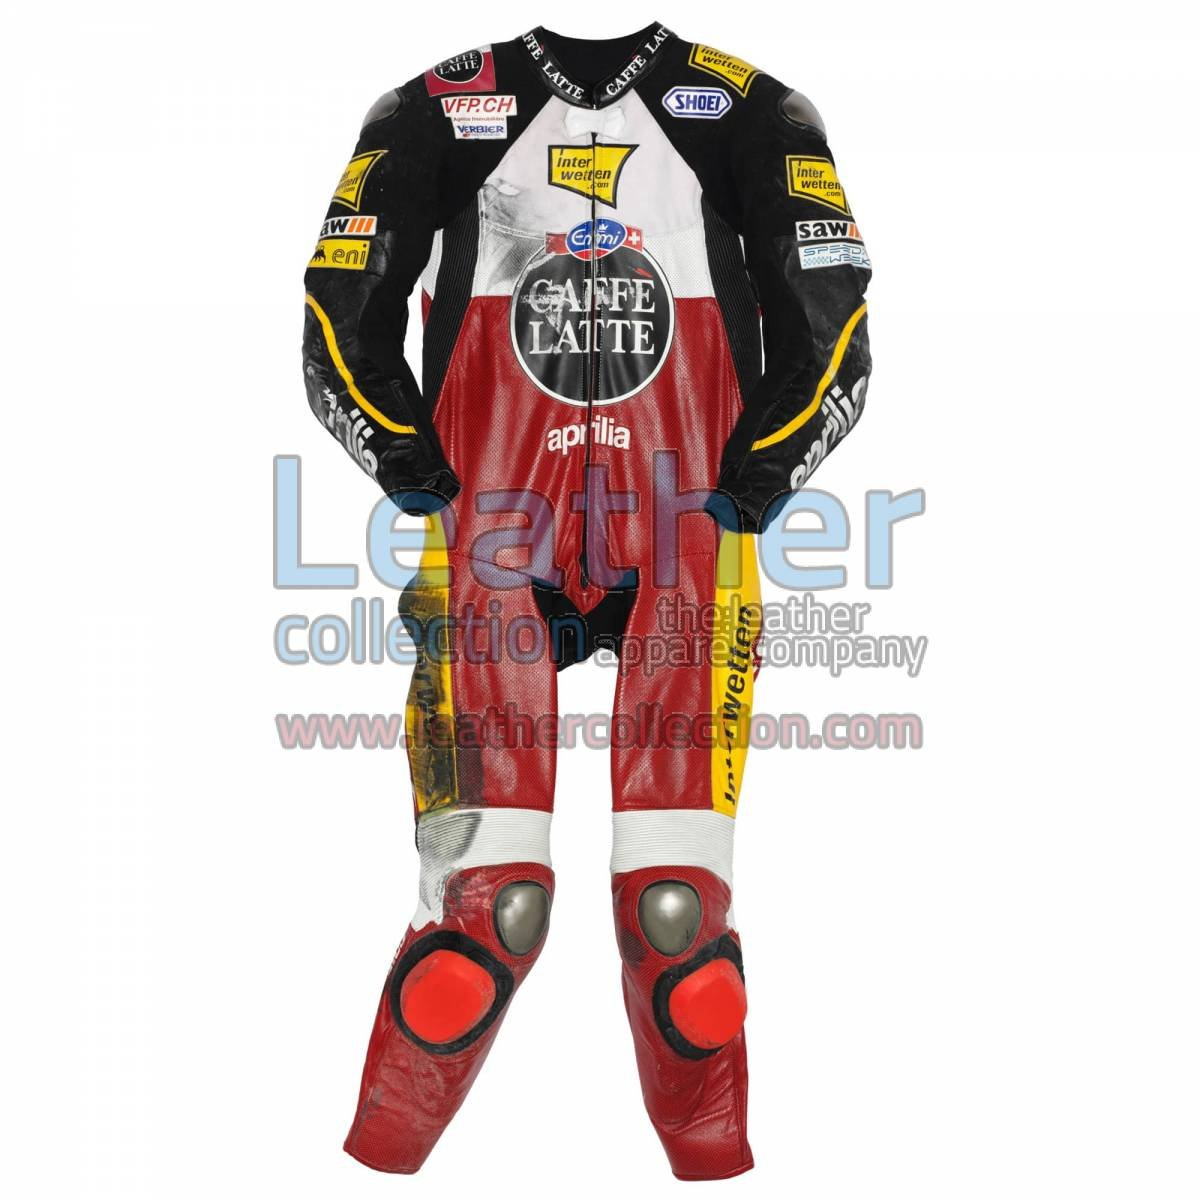 Thomas Luthi Aprilia GP 2009 Leather Suit